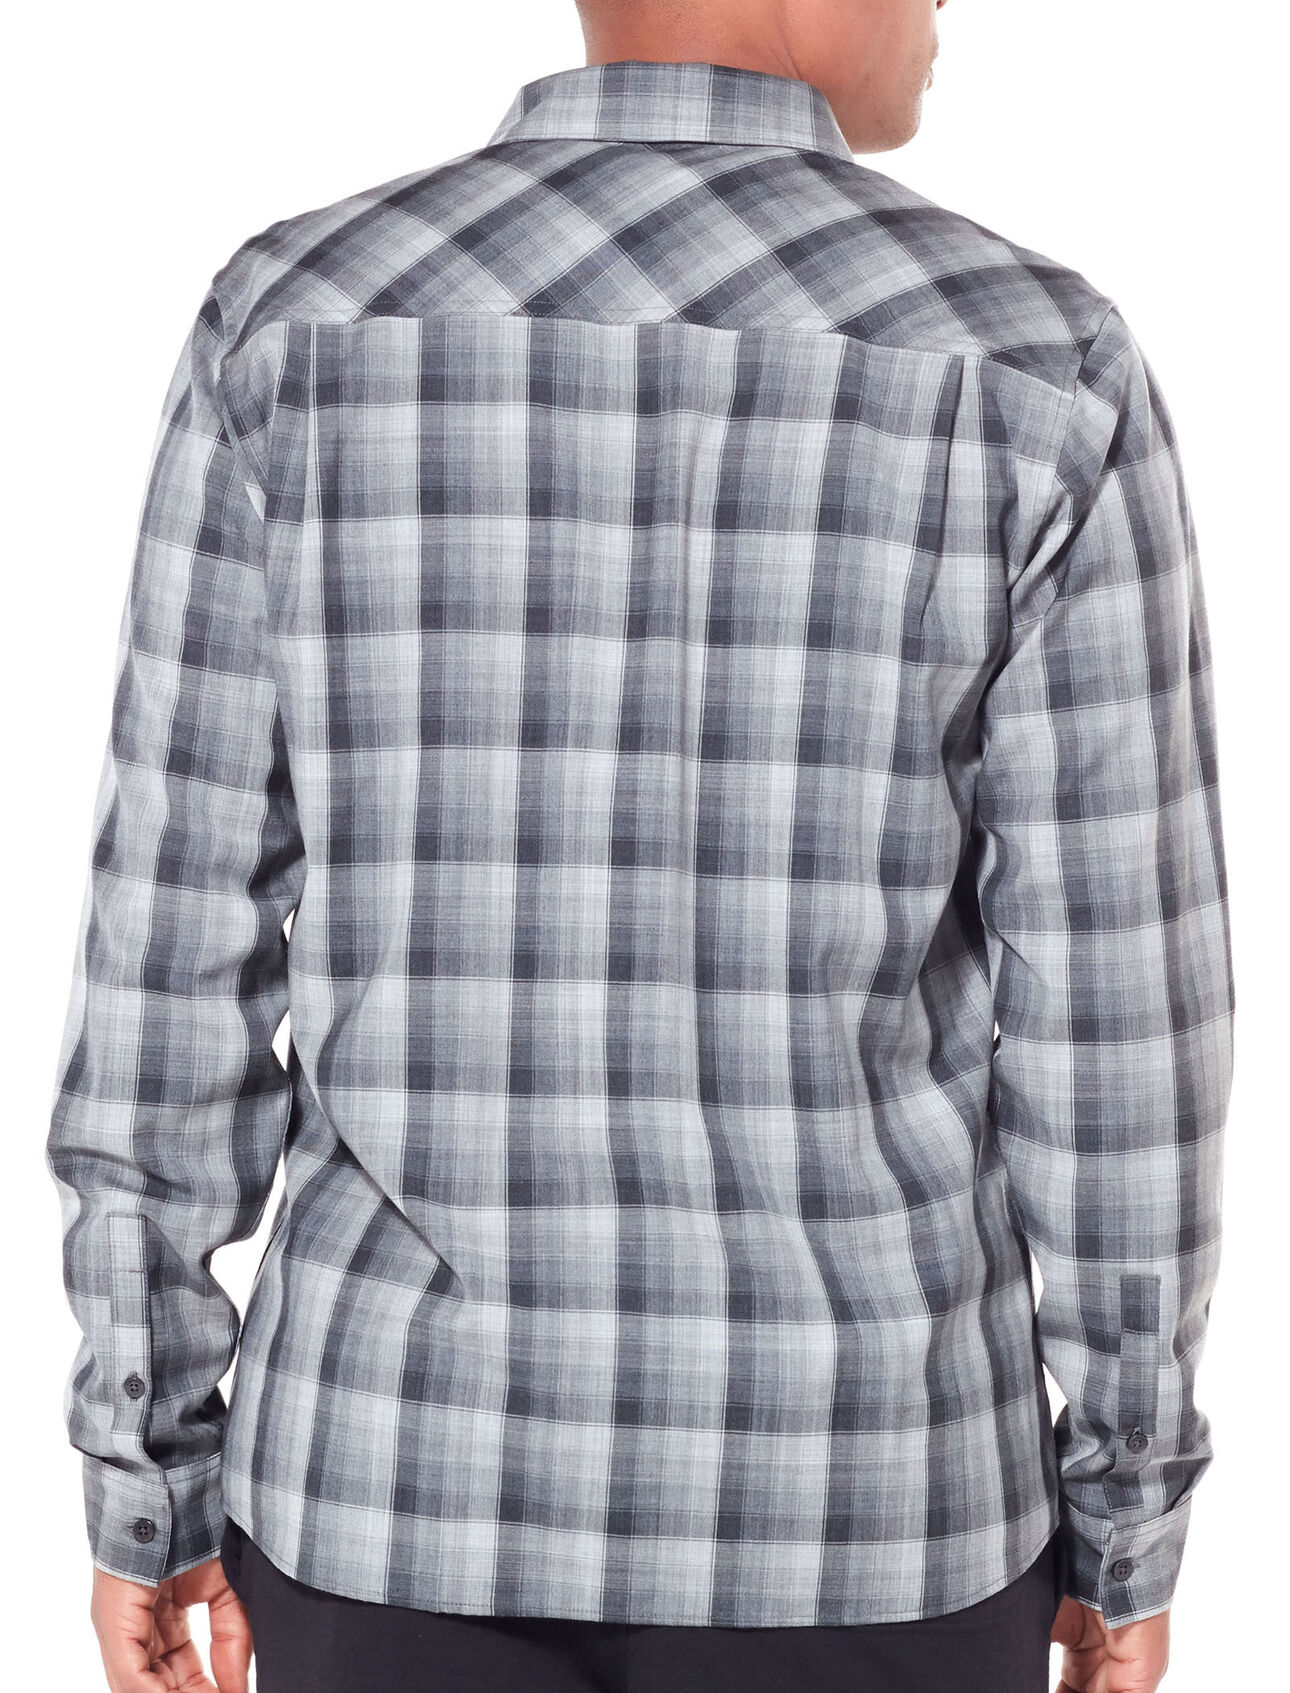 3b54c8ce2f Departure Long Sleeve Shirt - Icebreaker (US)